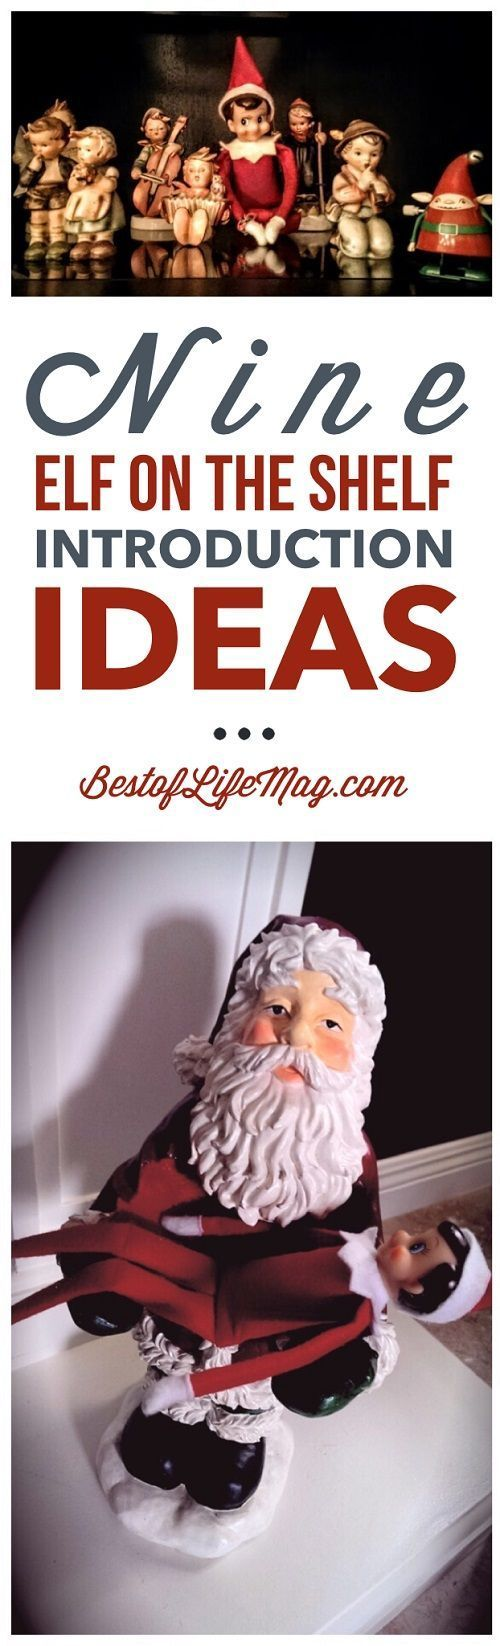 Top 50 elf on the shelf ideas i heart nap time - 9 Elf On The Shelf Introduction Ideas